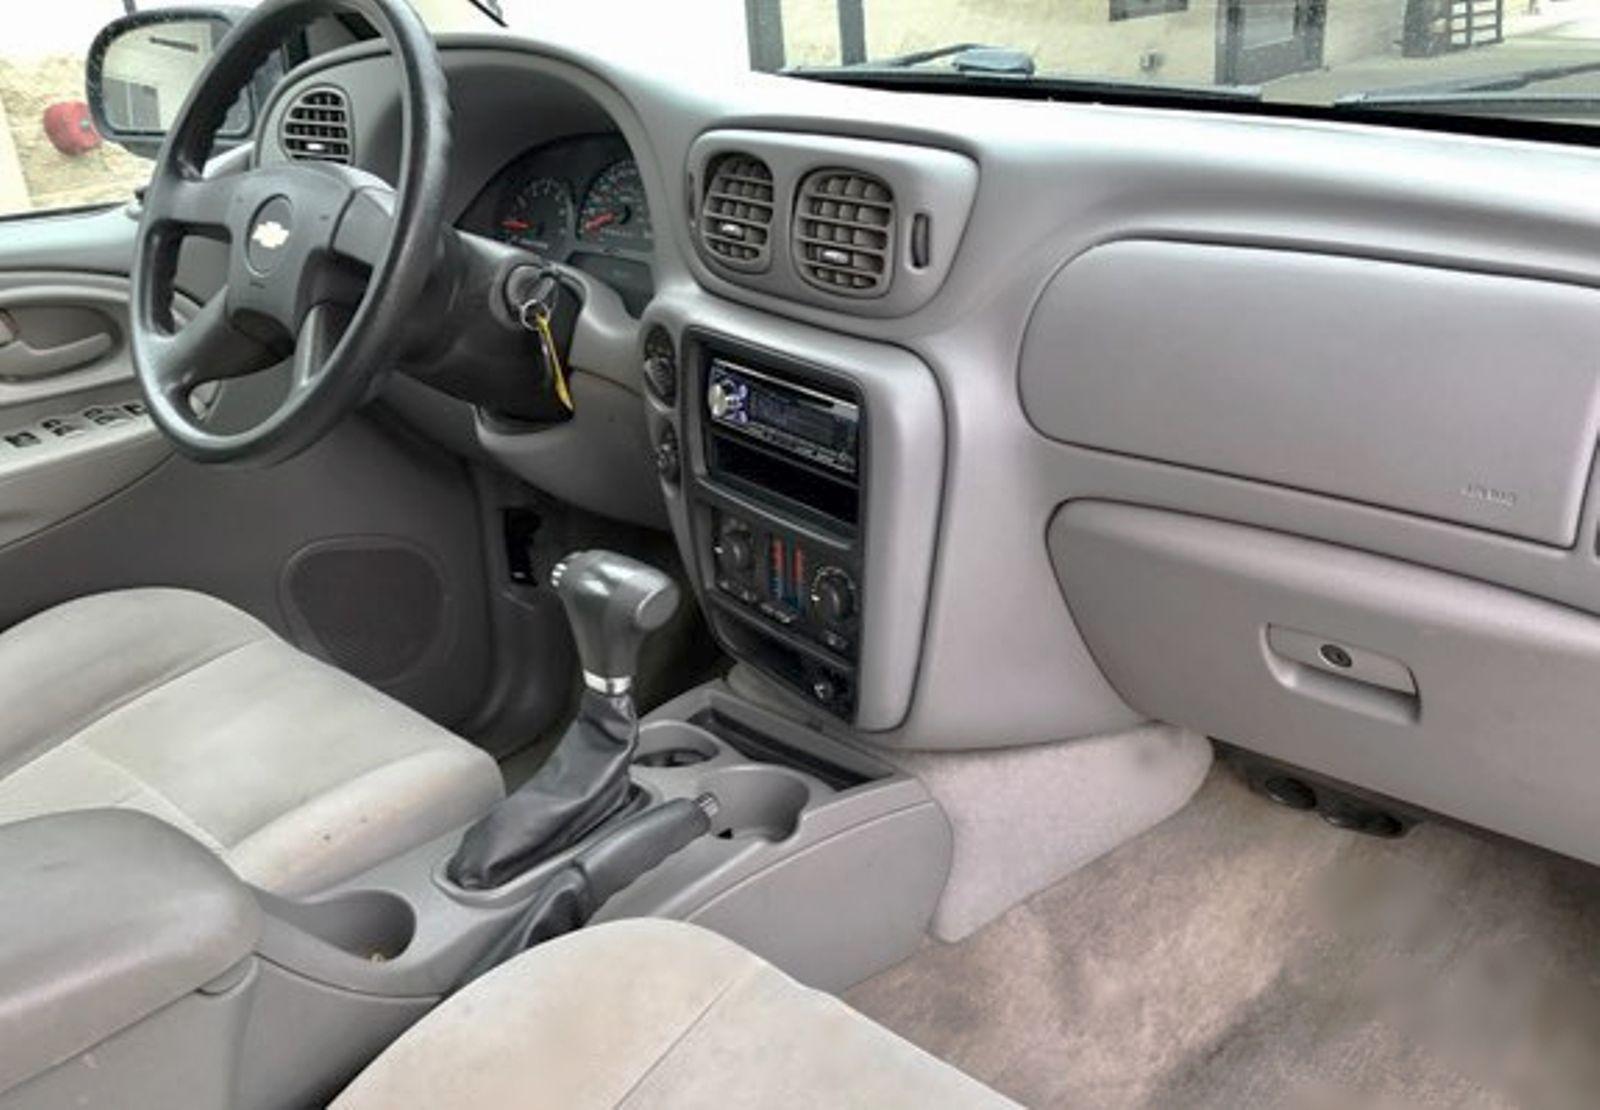 2008 Chevrolet Trailblazer Ls 4x4 Imports And More Inc 2006 Chevy Alternator Plug Wiring In Lenoir City Tn